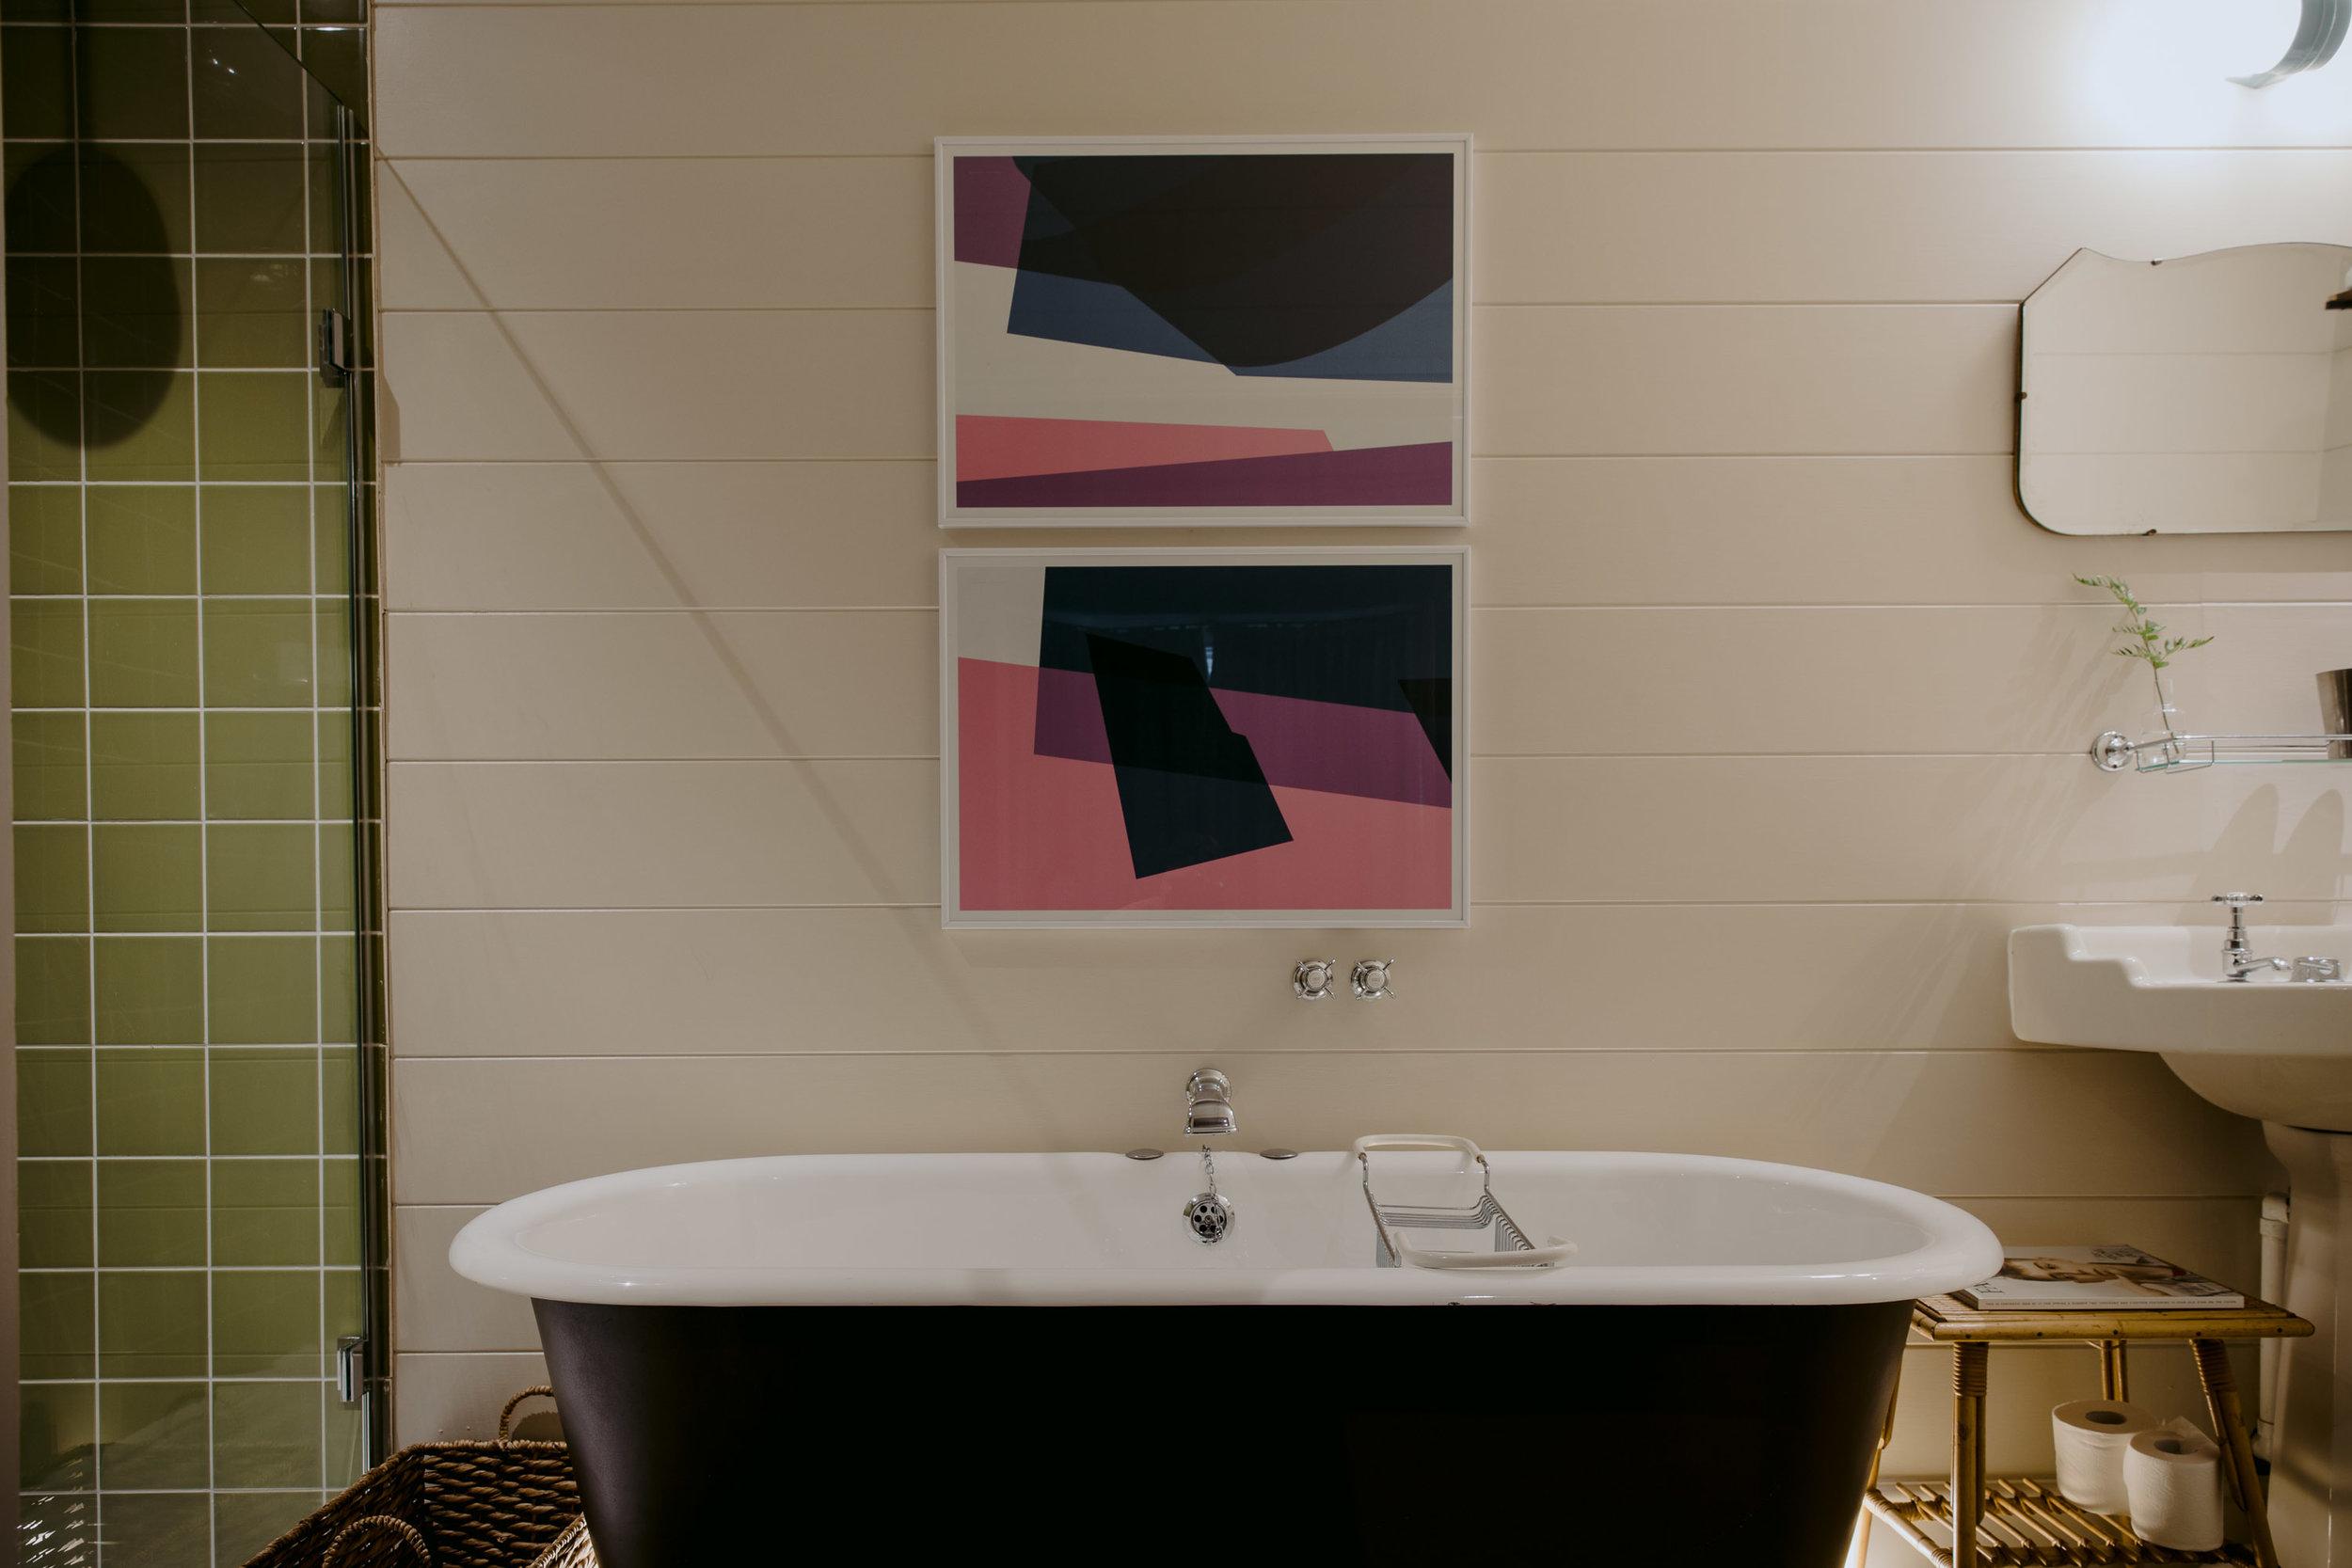 deal-hotel-the-rose-kent-coast-interior-design-support-local-magazine-styling-refurb-1-60gh.jpg